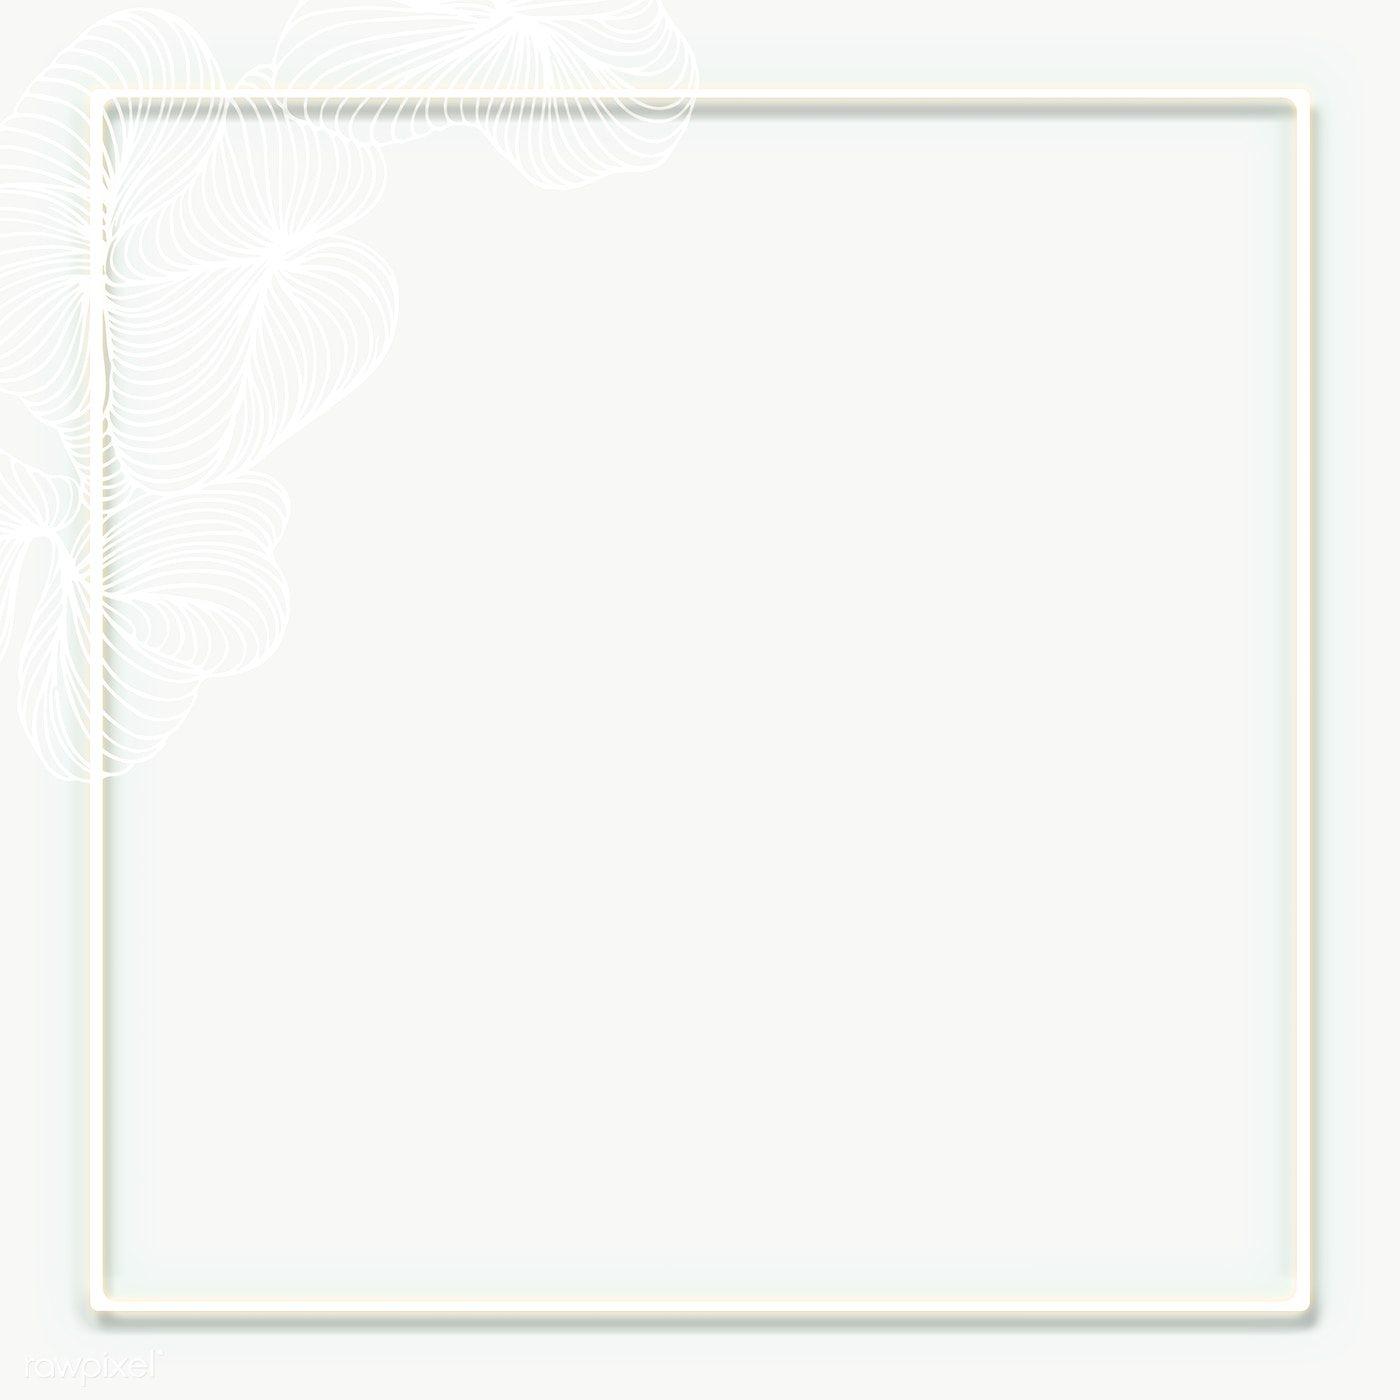 Bright White Square Frame Transparent Png Premium Image By Rawpixel Com Nunny White Square Frame Square Frames Gold Picture Frames